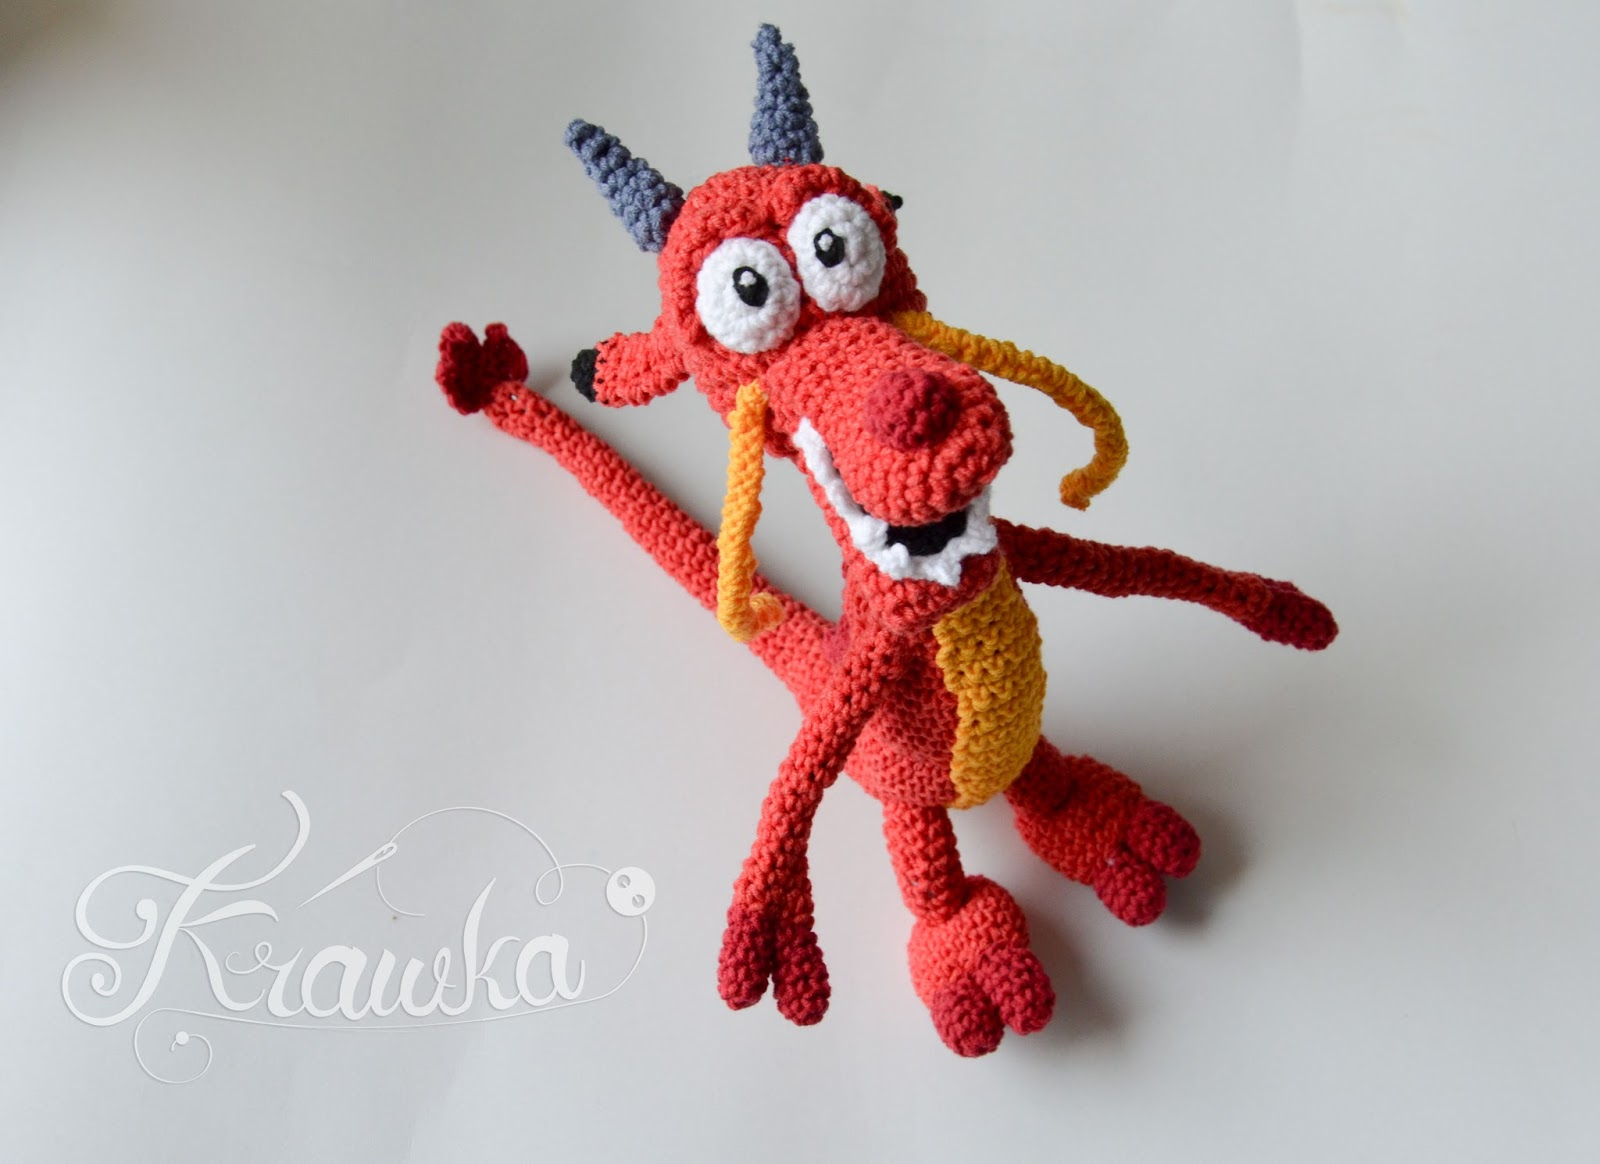 Krawka: Mushu the red dragon